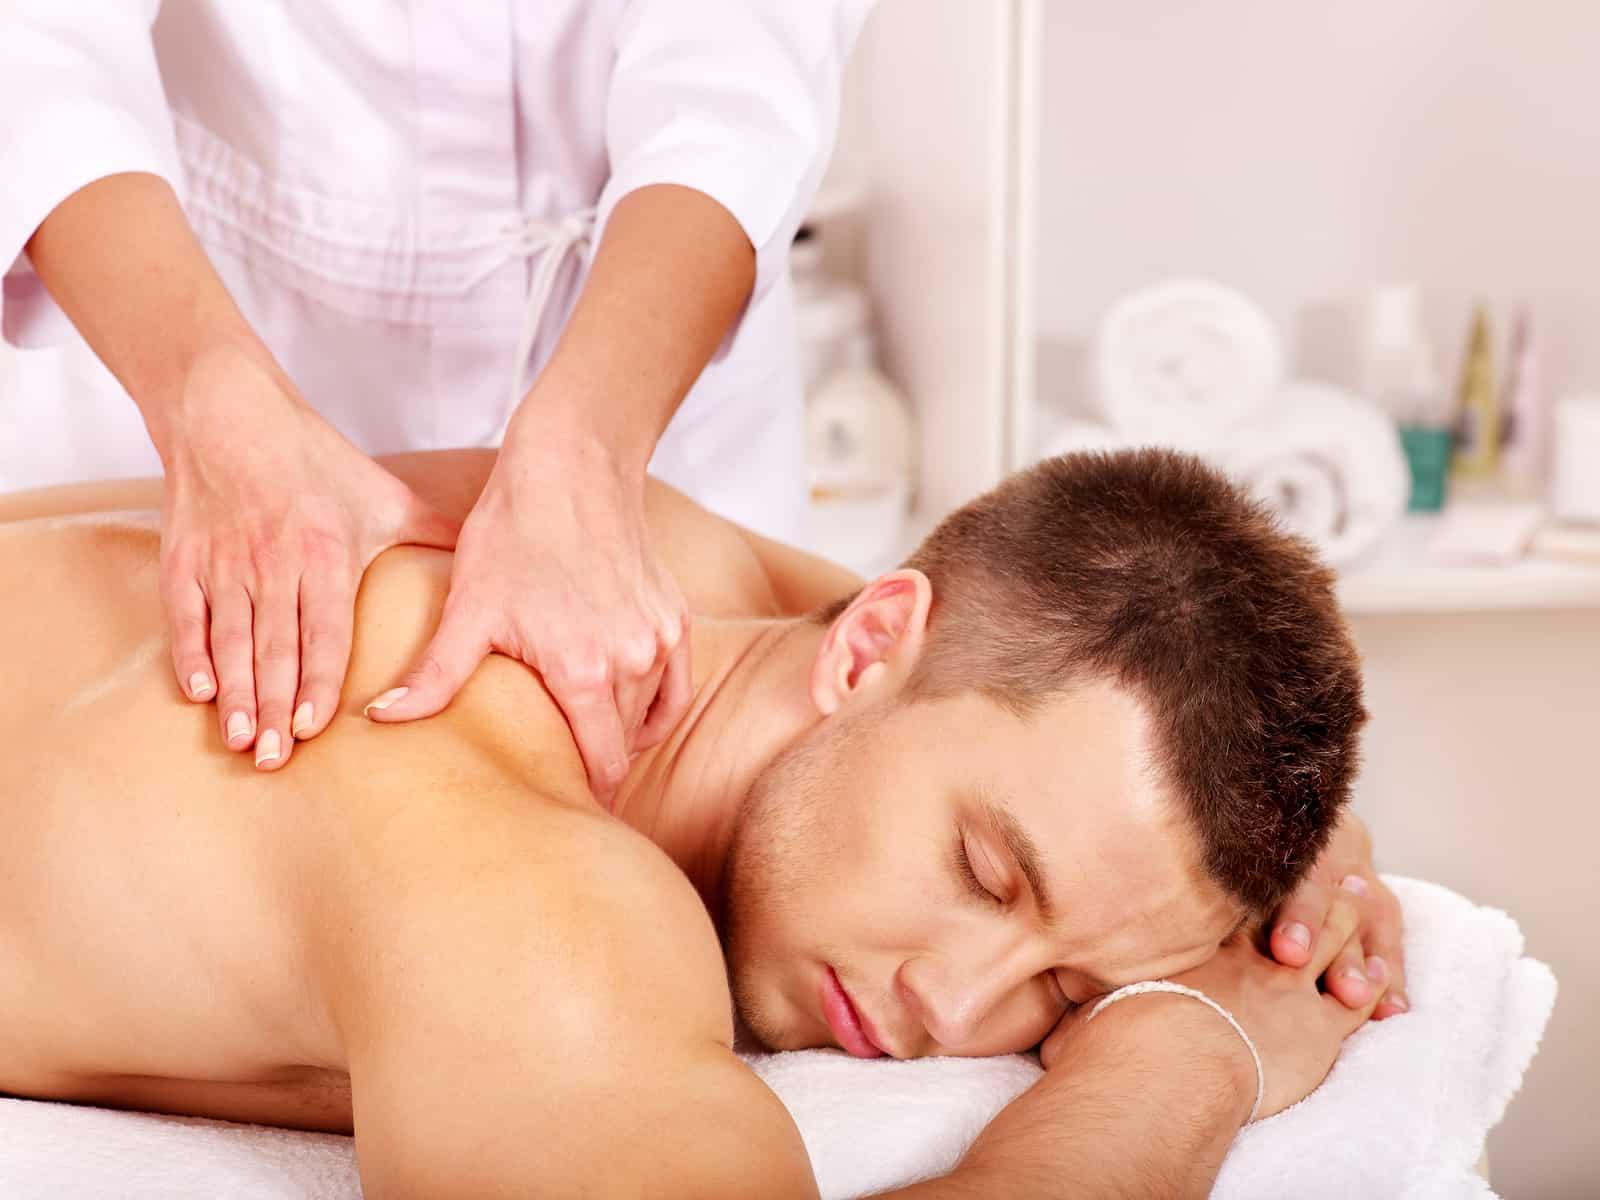 massage service in bangalore